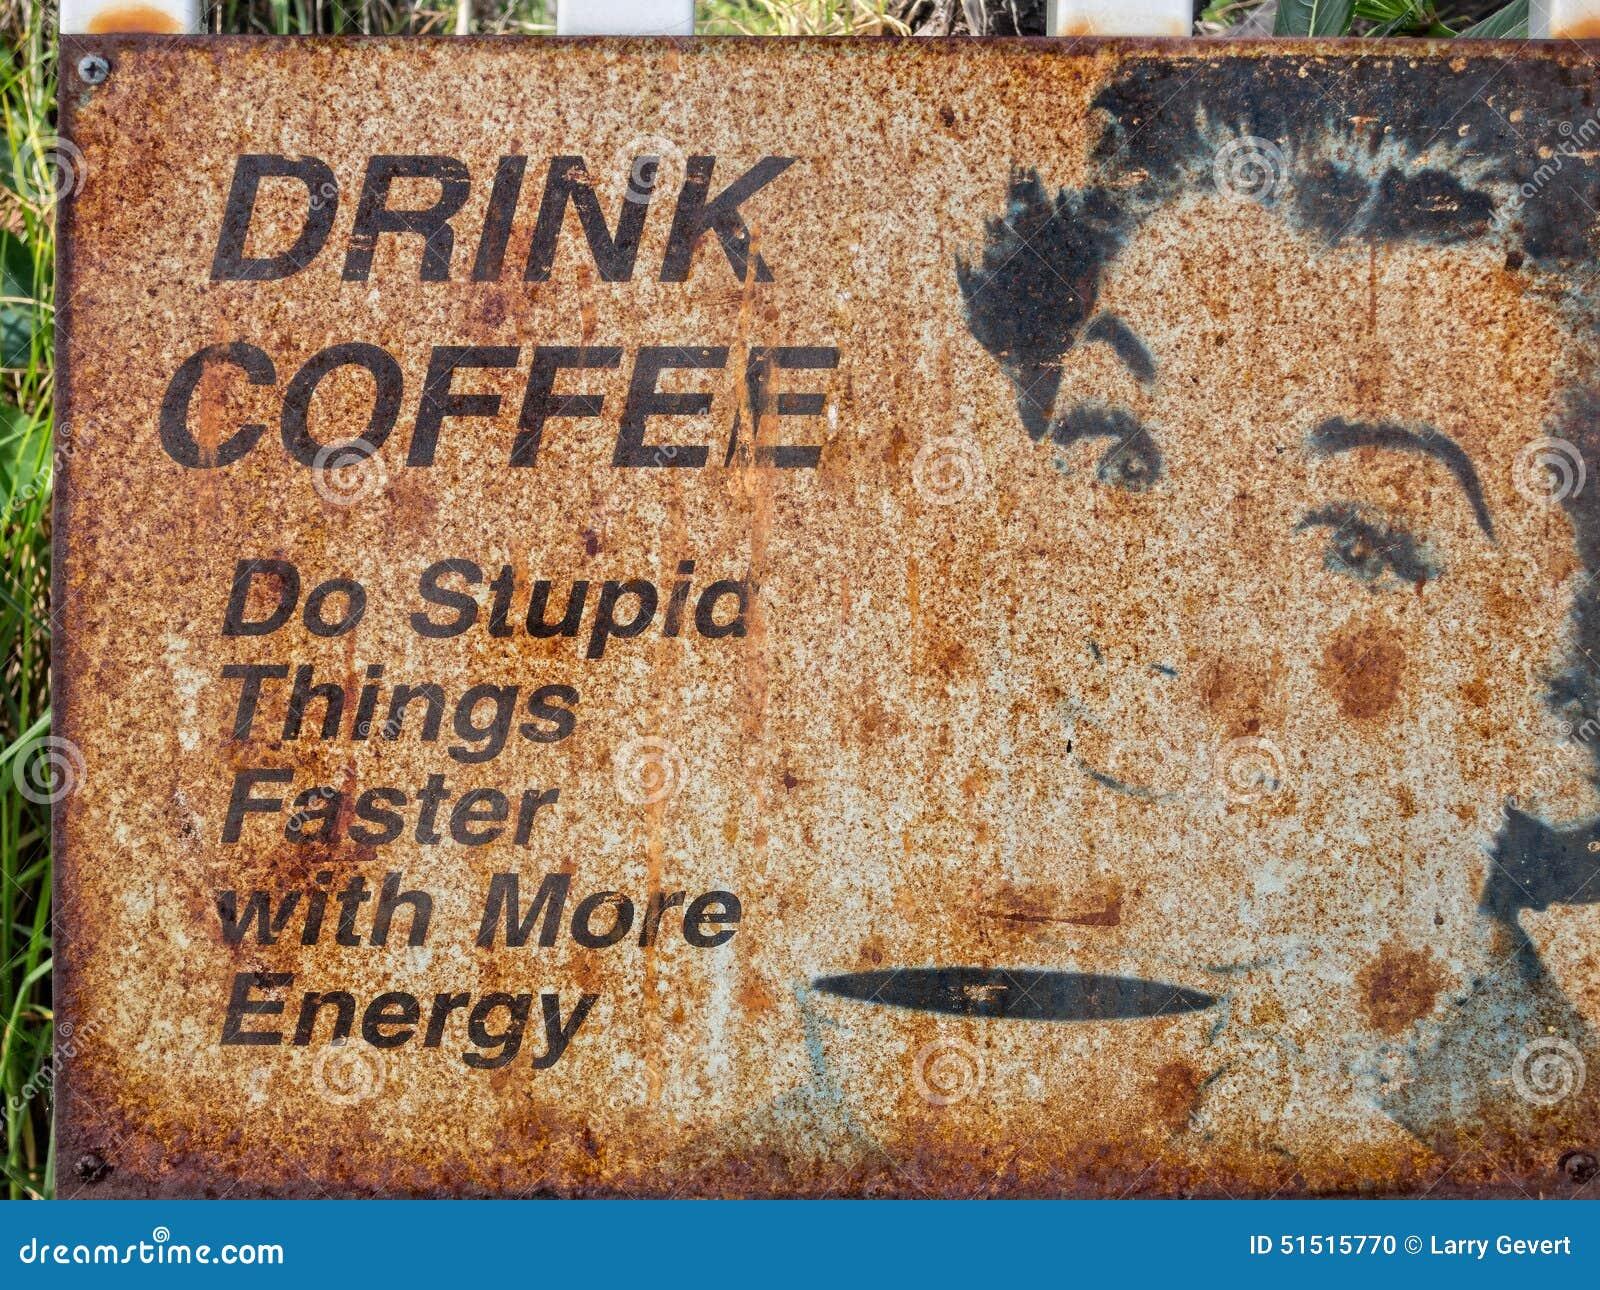 Drink koffieteken